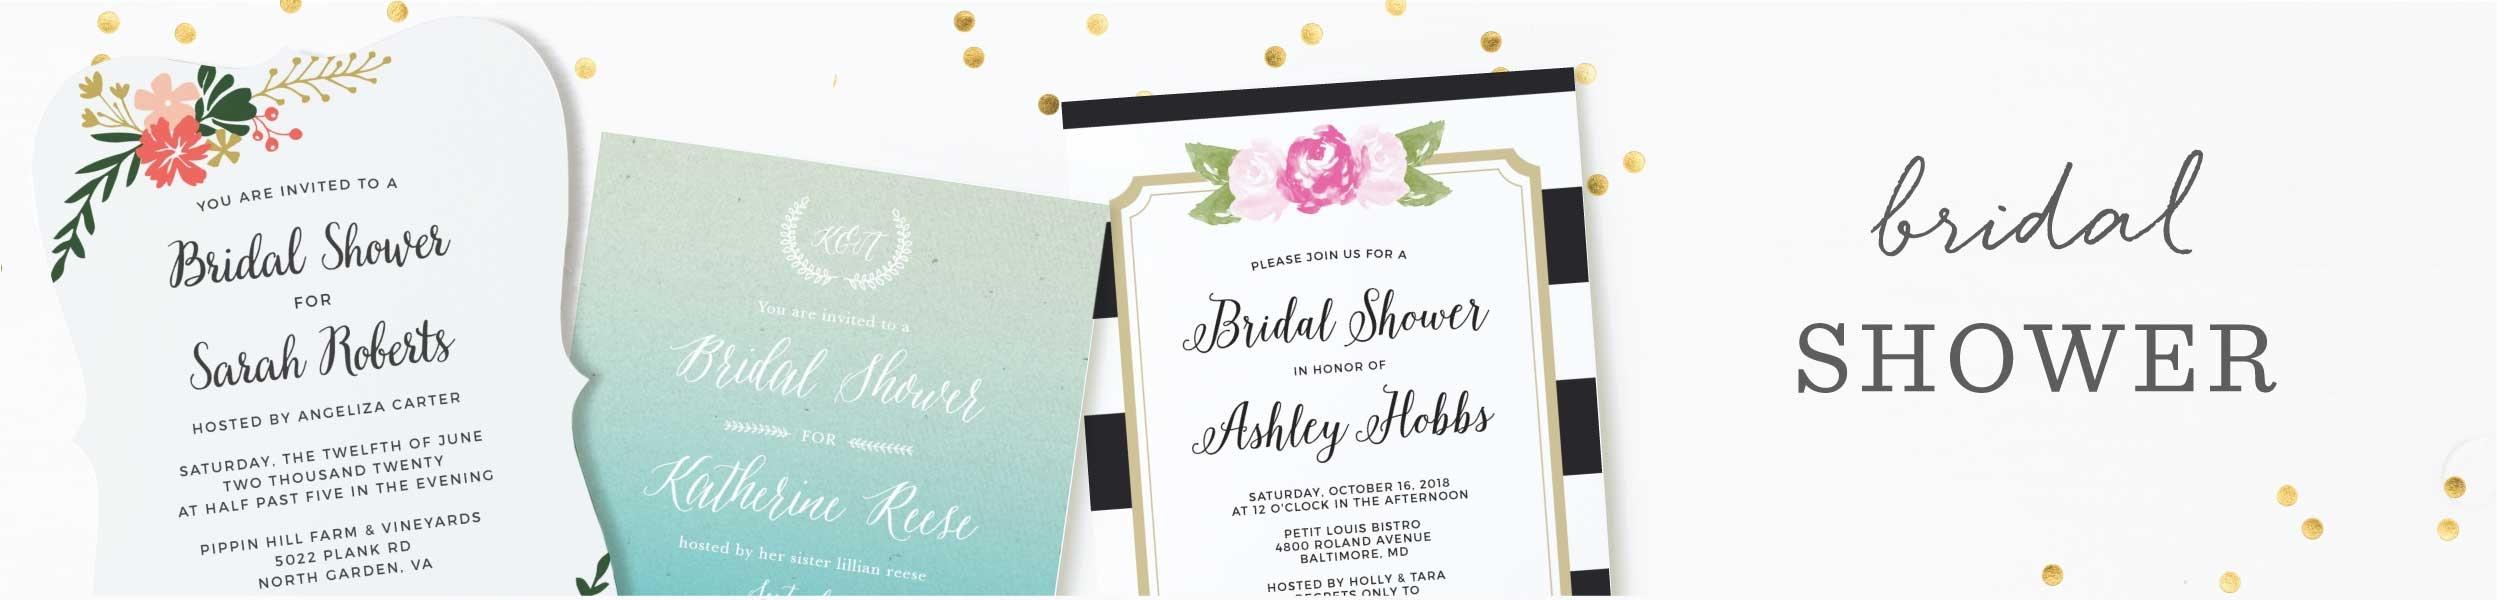 Fullsize Of Bridal Shower Invitations